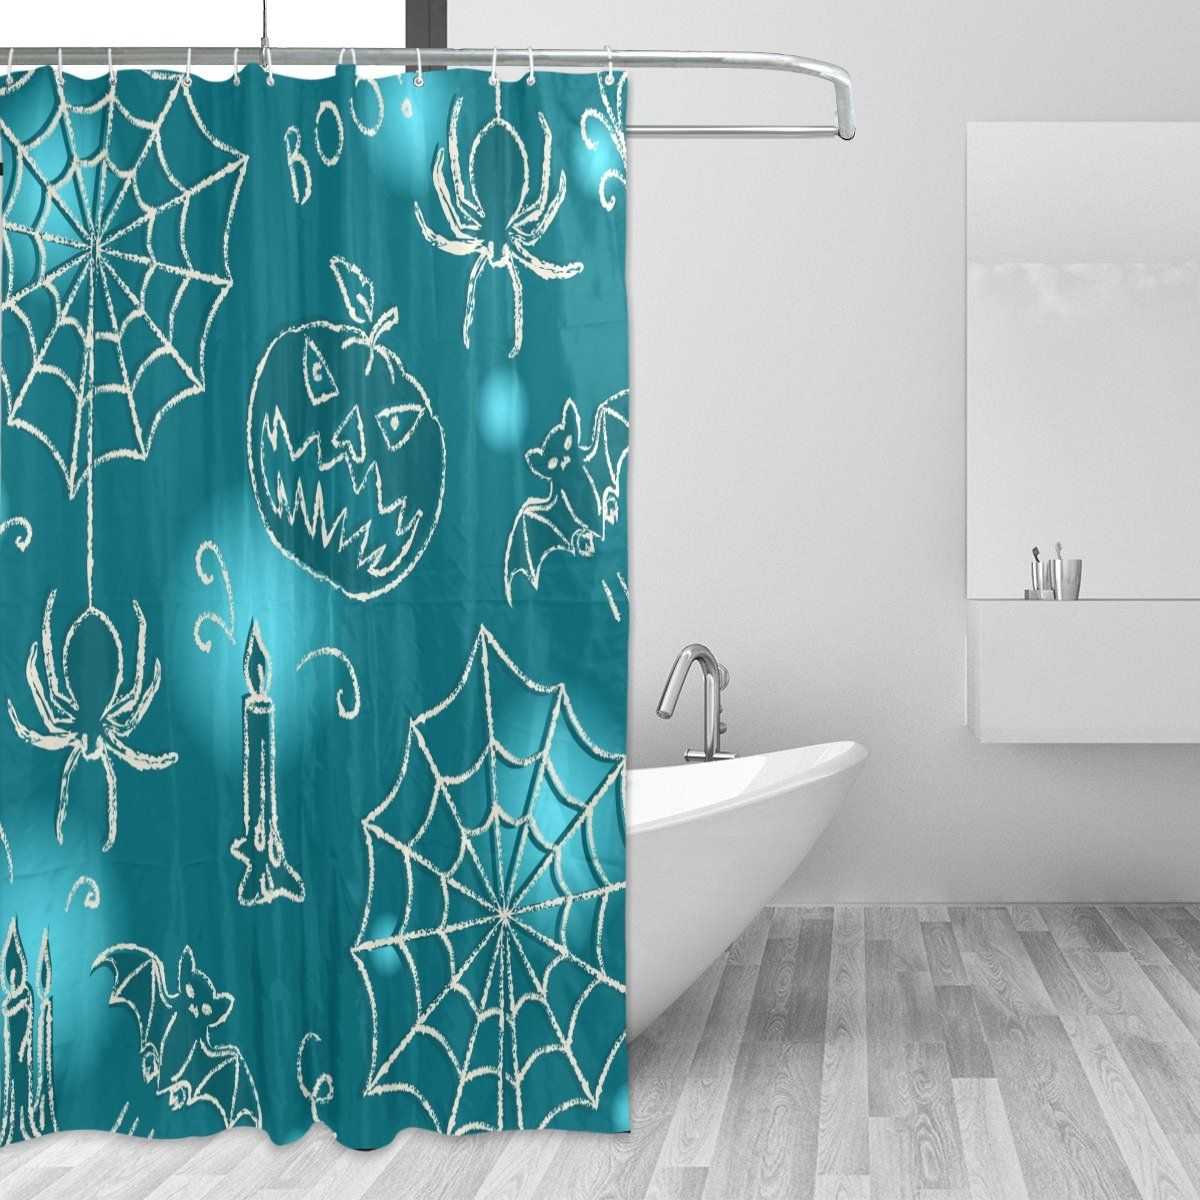 Giovanior Halloween Spider Bat Candle Fabric Resistant Waterproof